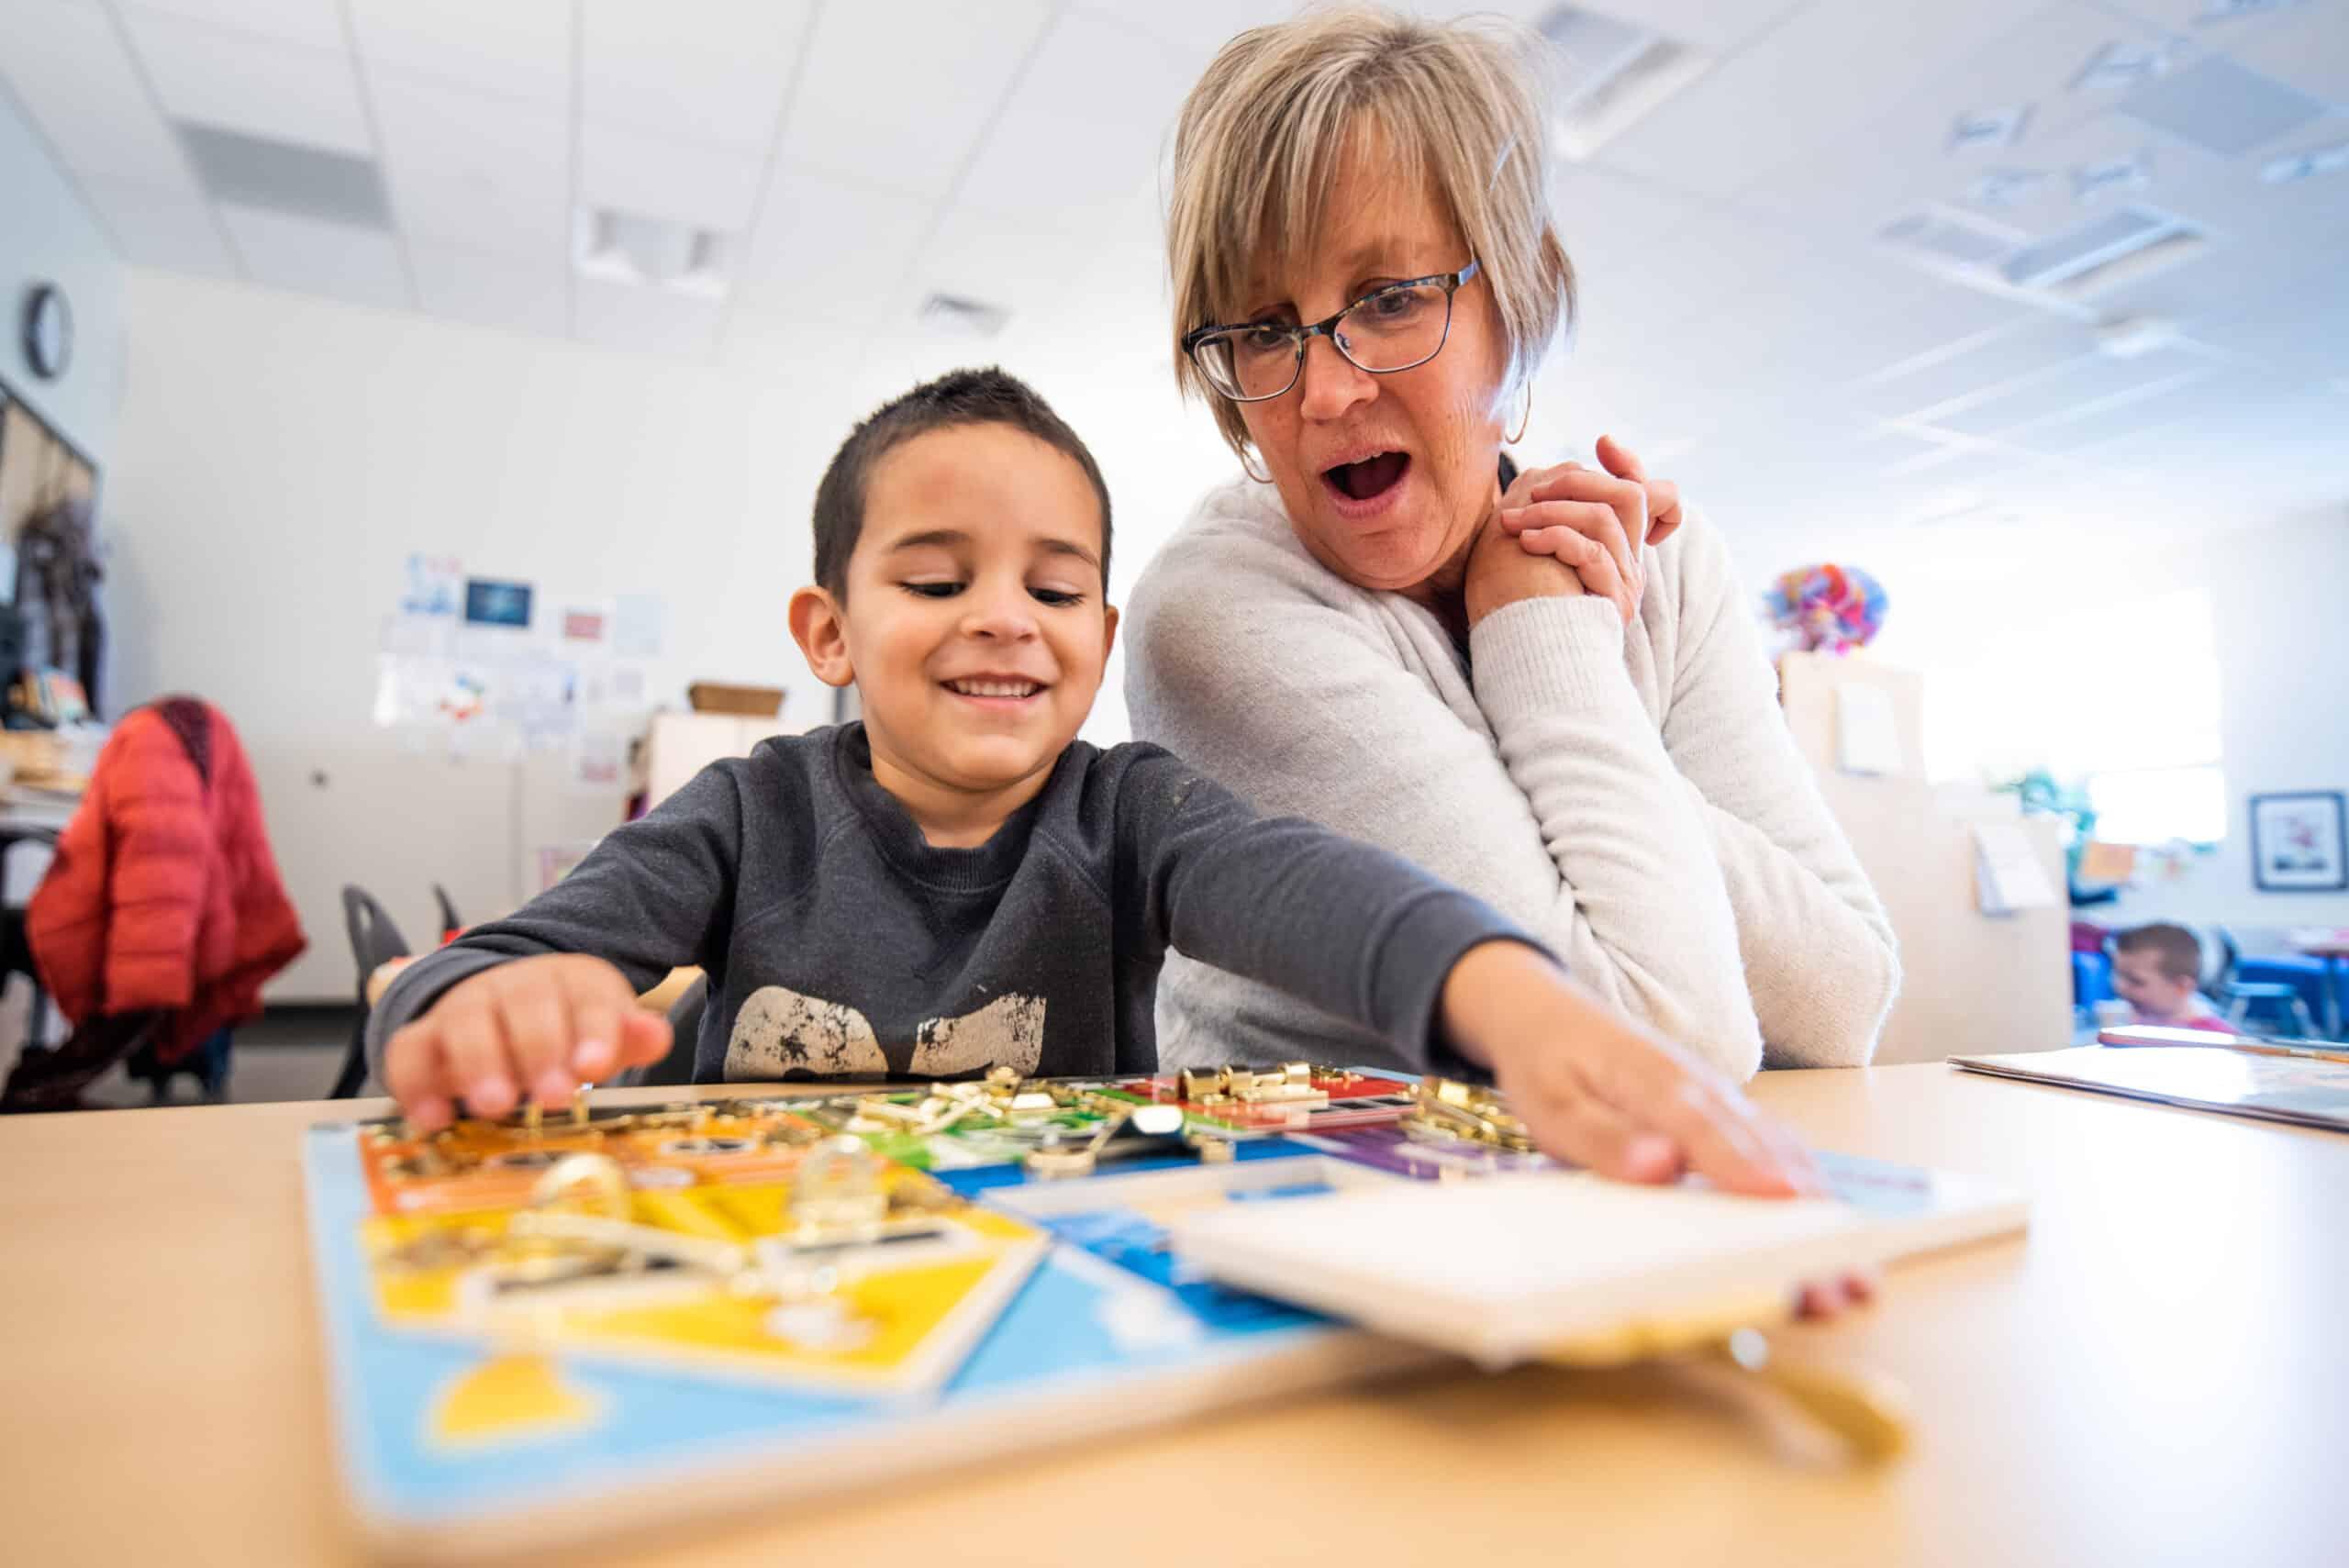 Grand View Elementary preschooler and Joan Scheuerman learning together